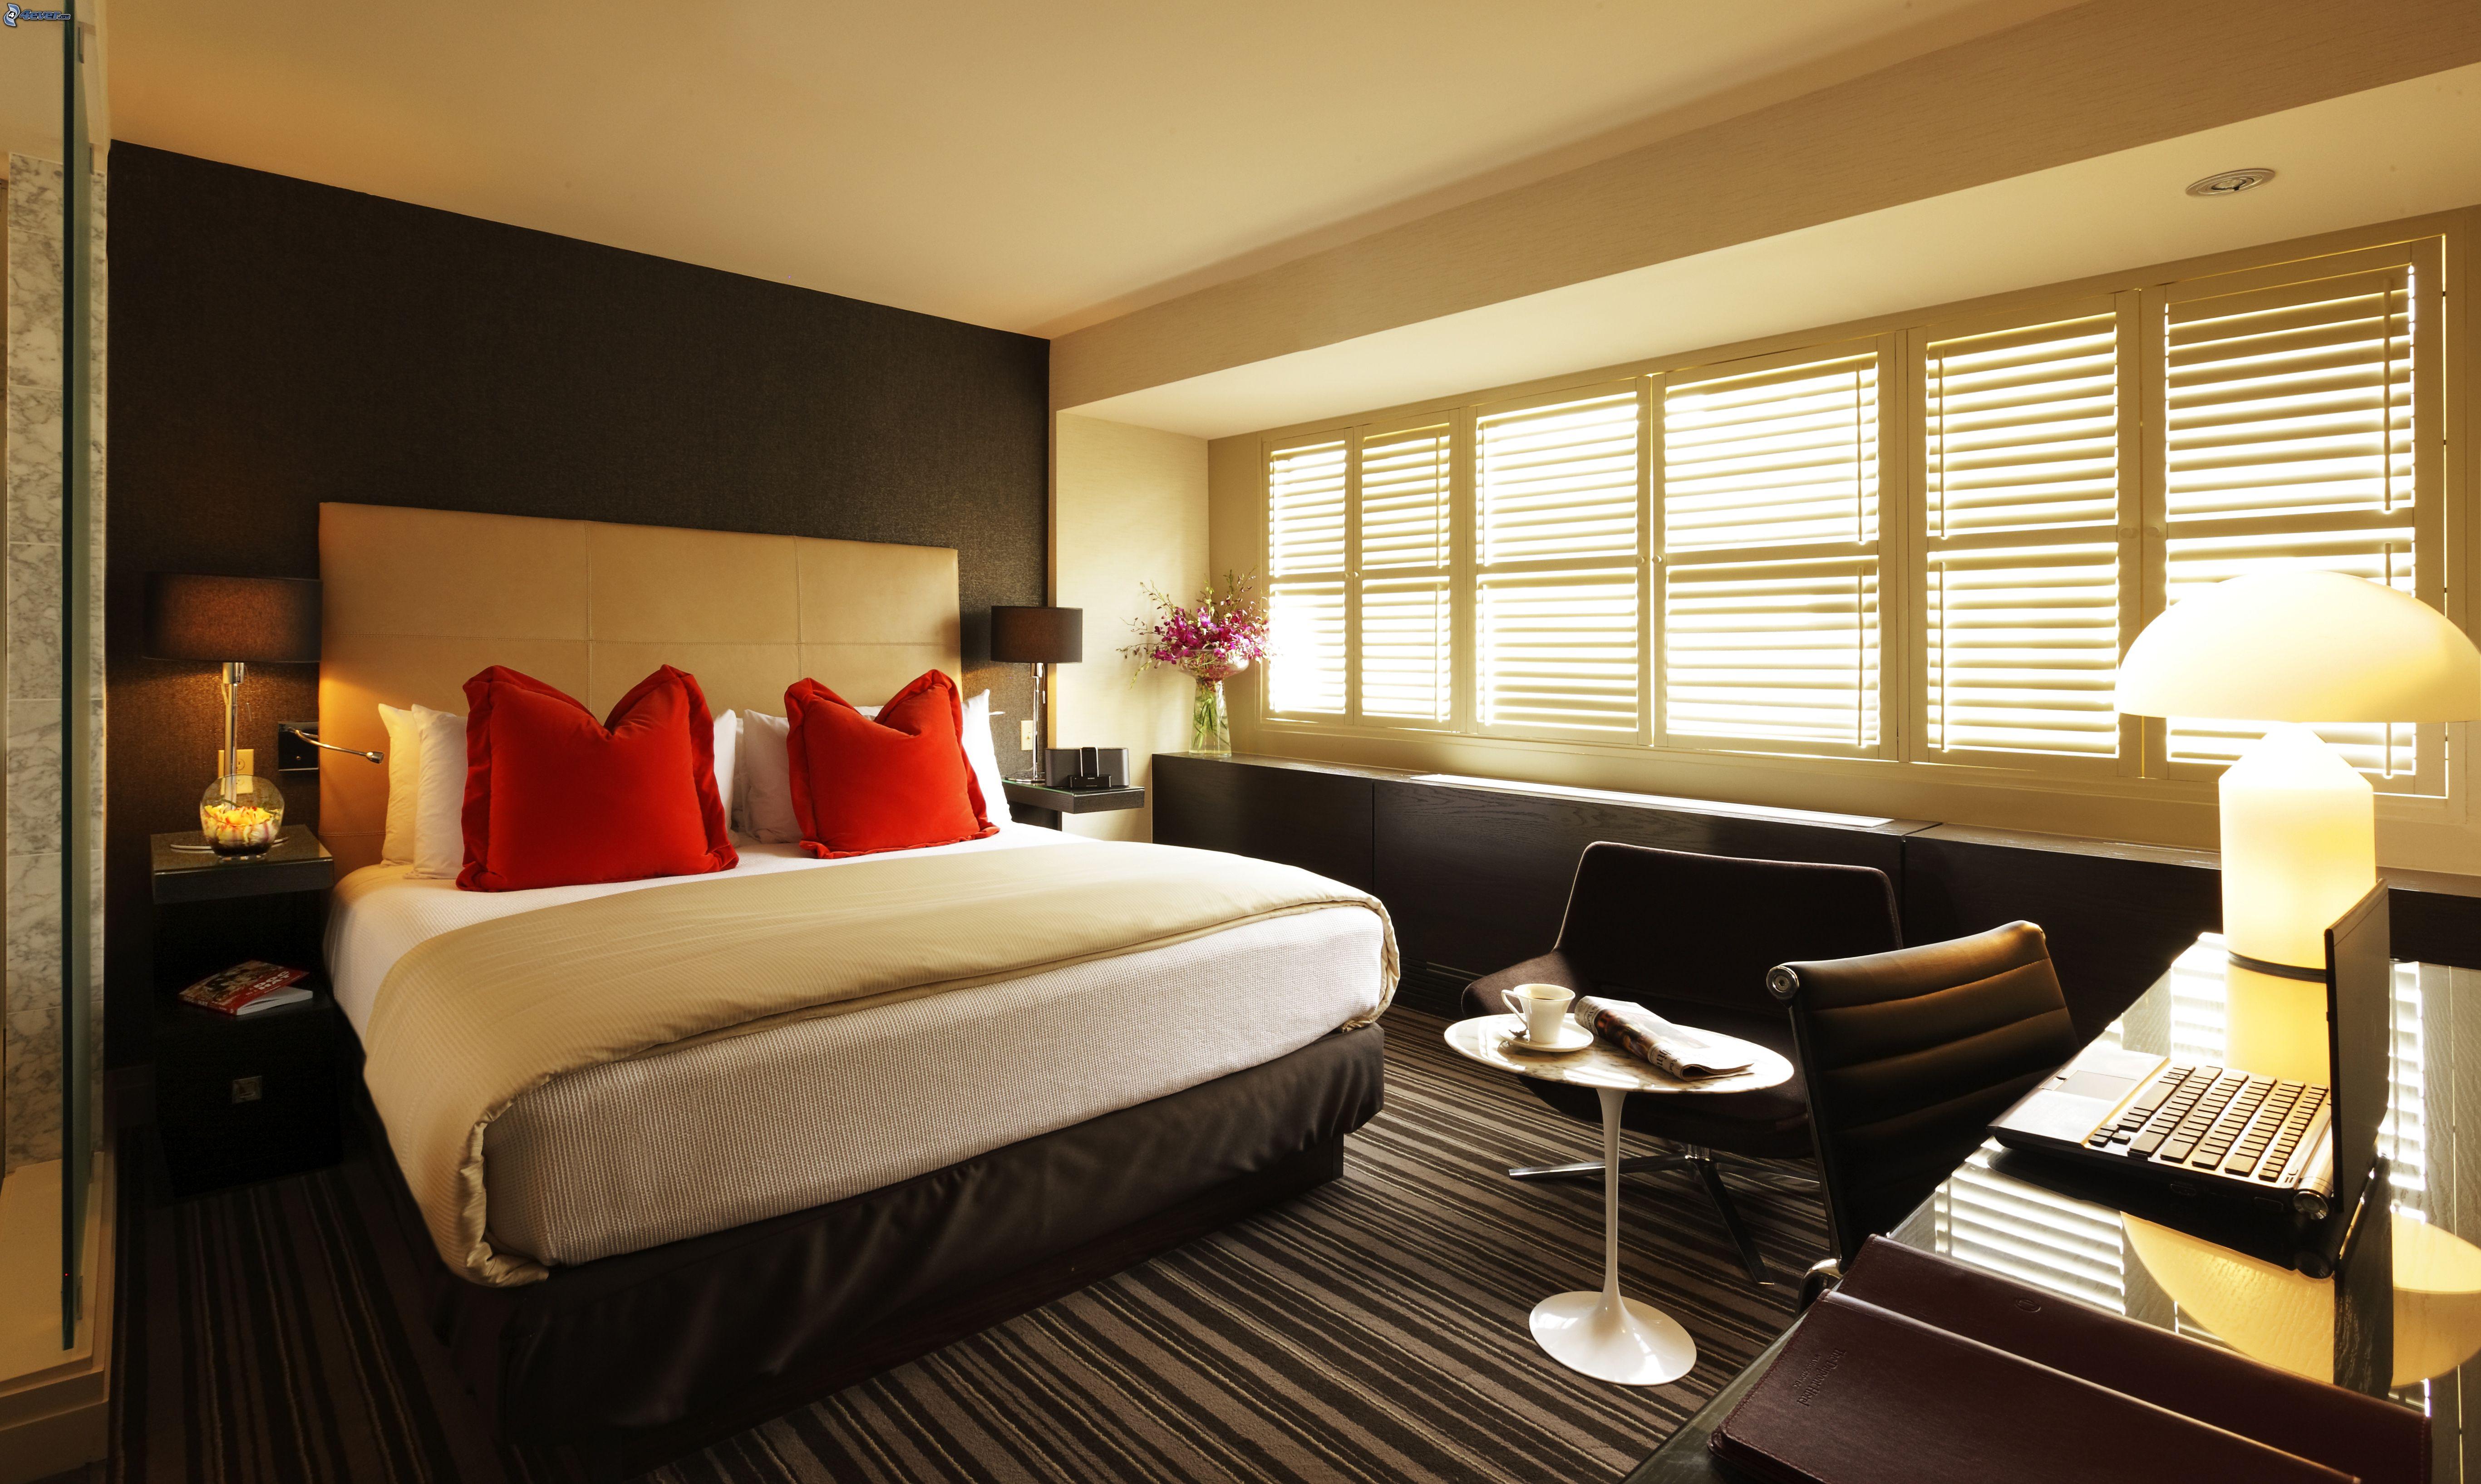 Chambre Bleu De Prusse: LocationPhotoDirectLink g d i Hotel La ...